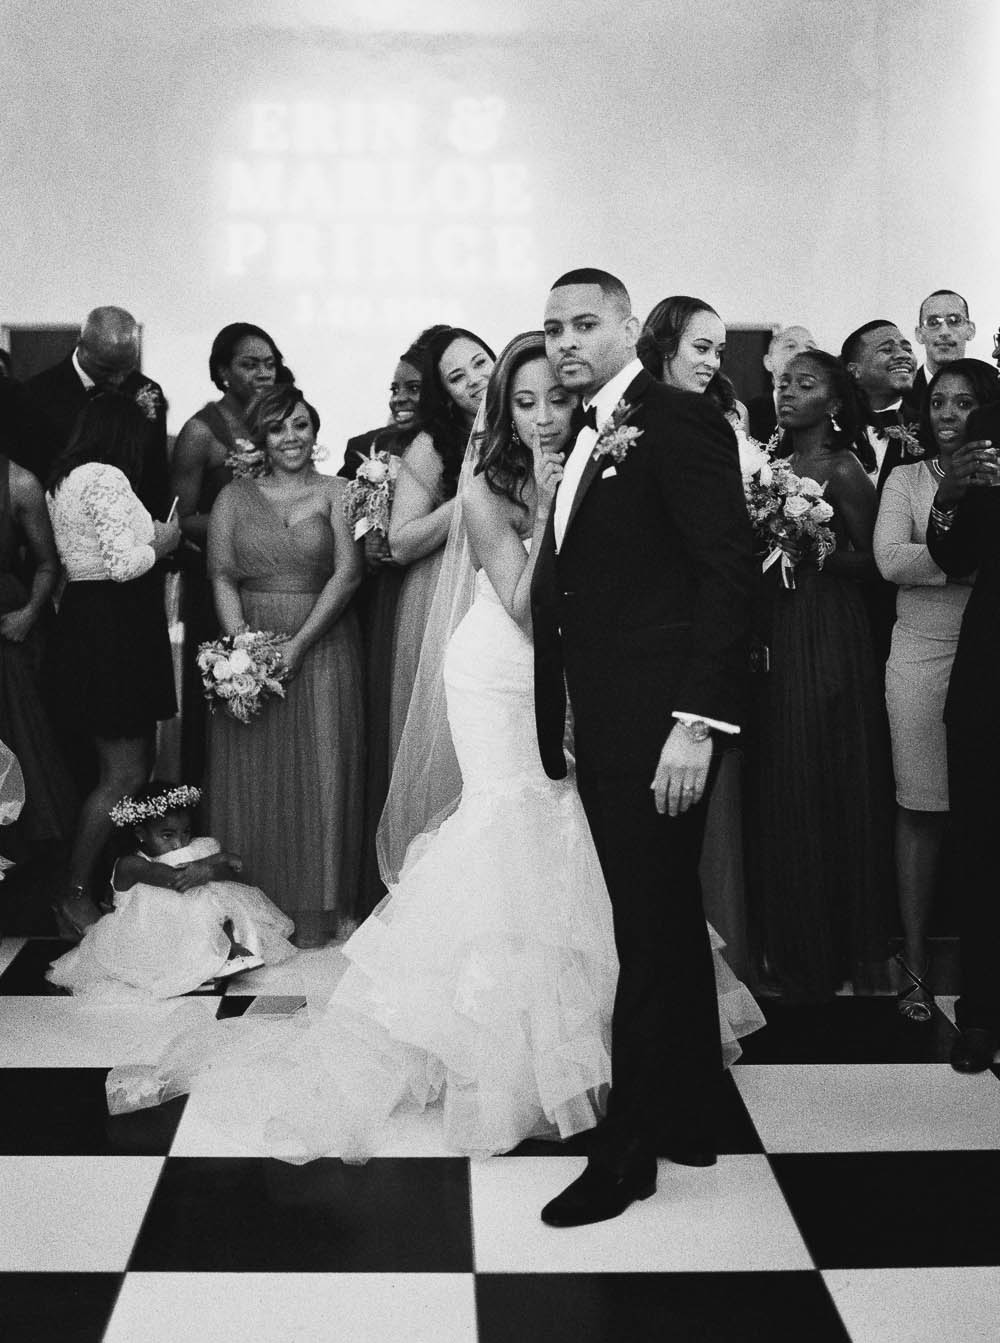 nashville ruby film documentary wedding photographer heartfelt real moments african american wedding munalachi bride ©2016abigailbobophotography-43.jpg